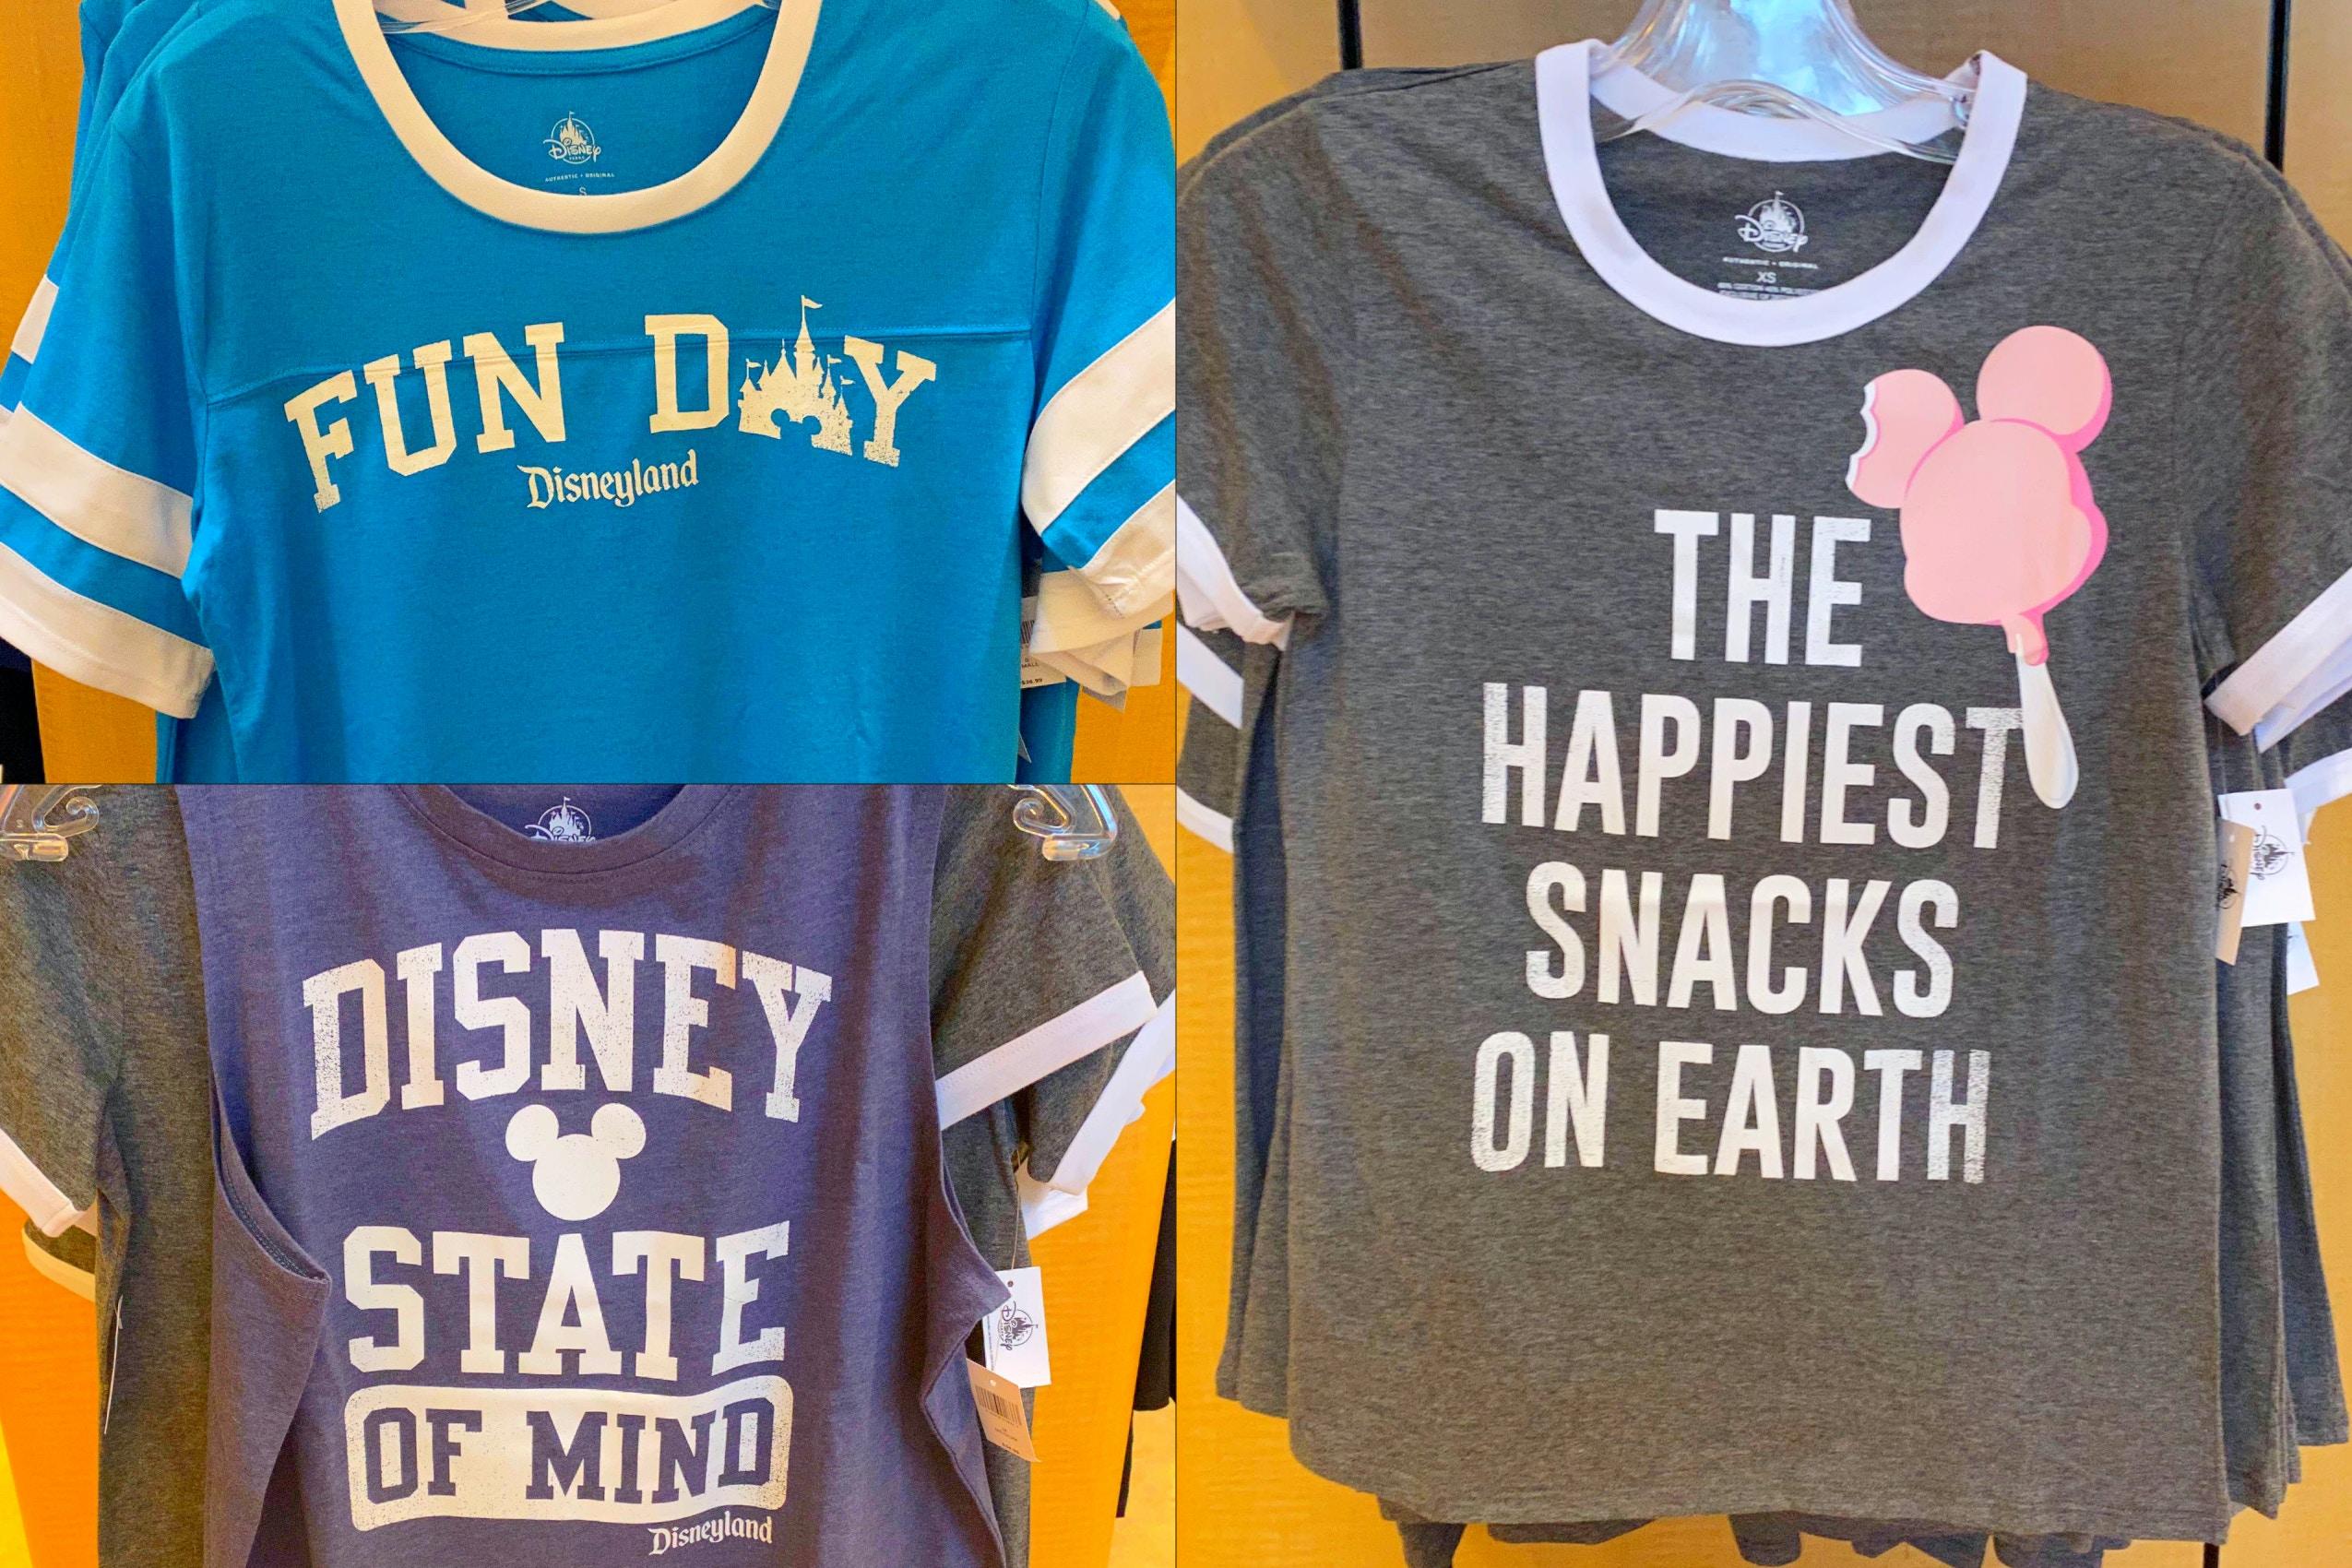 disneyland-shirt-collage-02-23-20.jpg